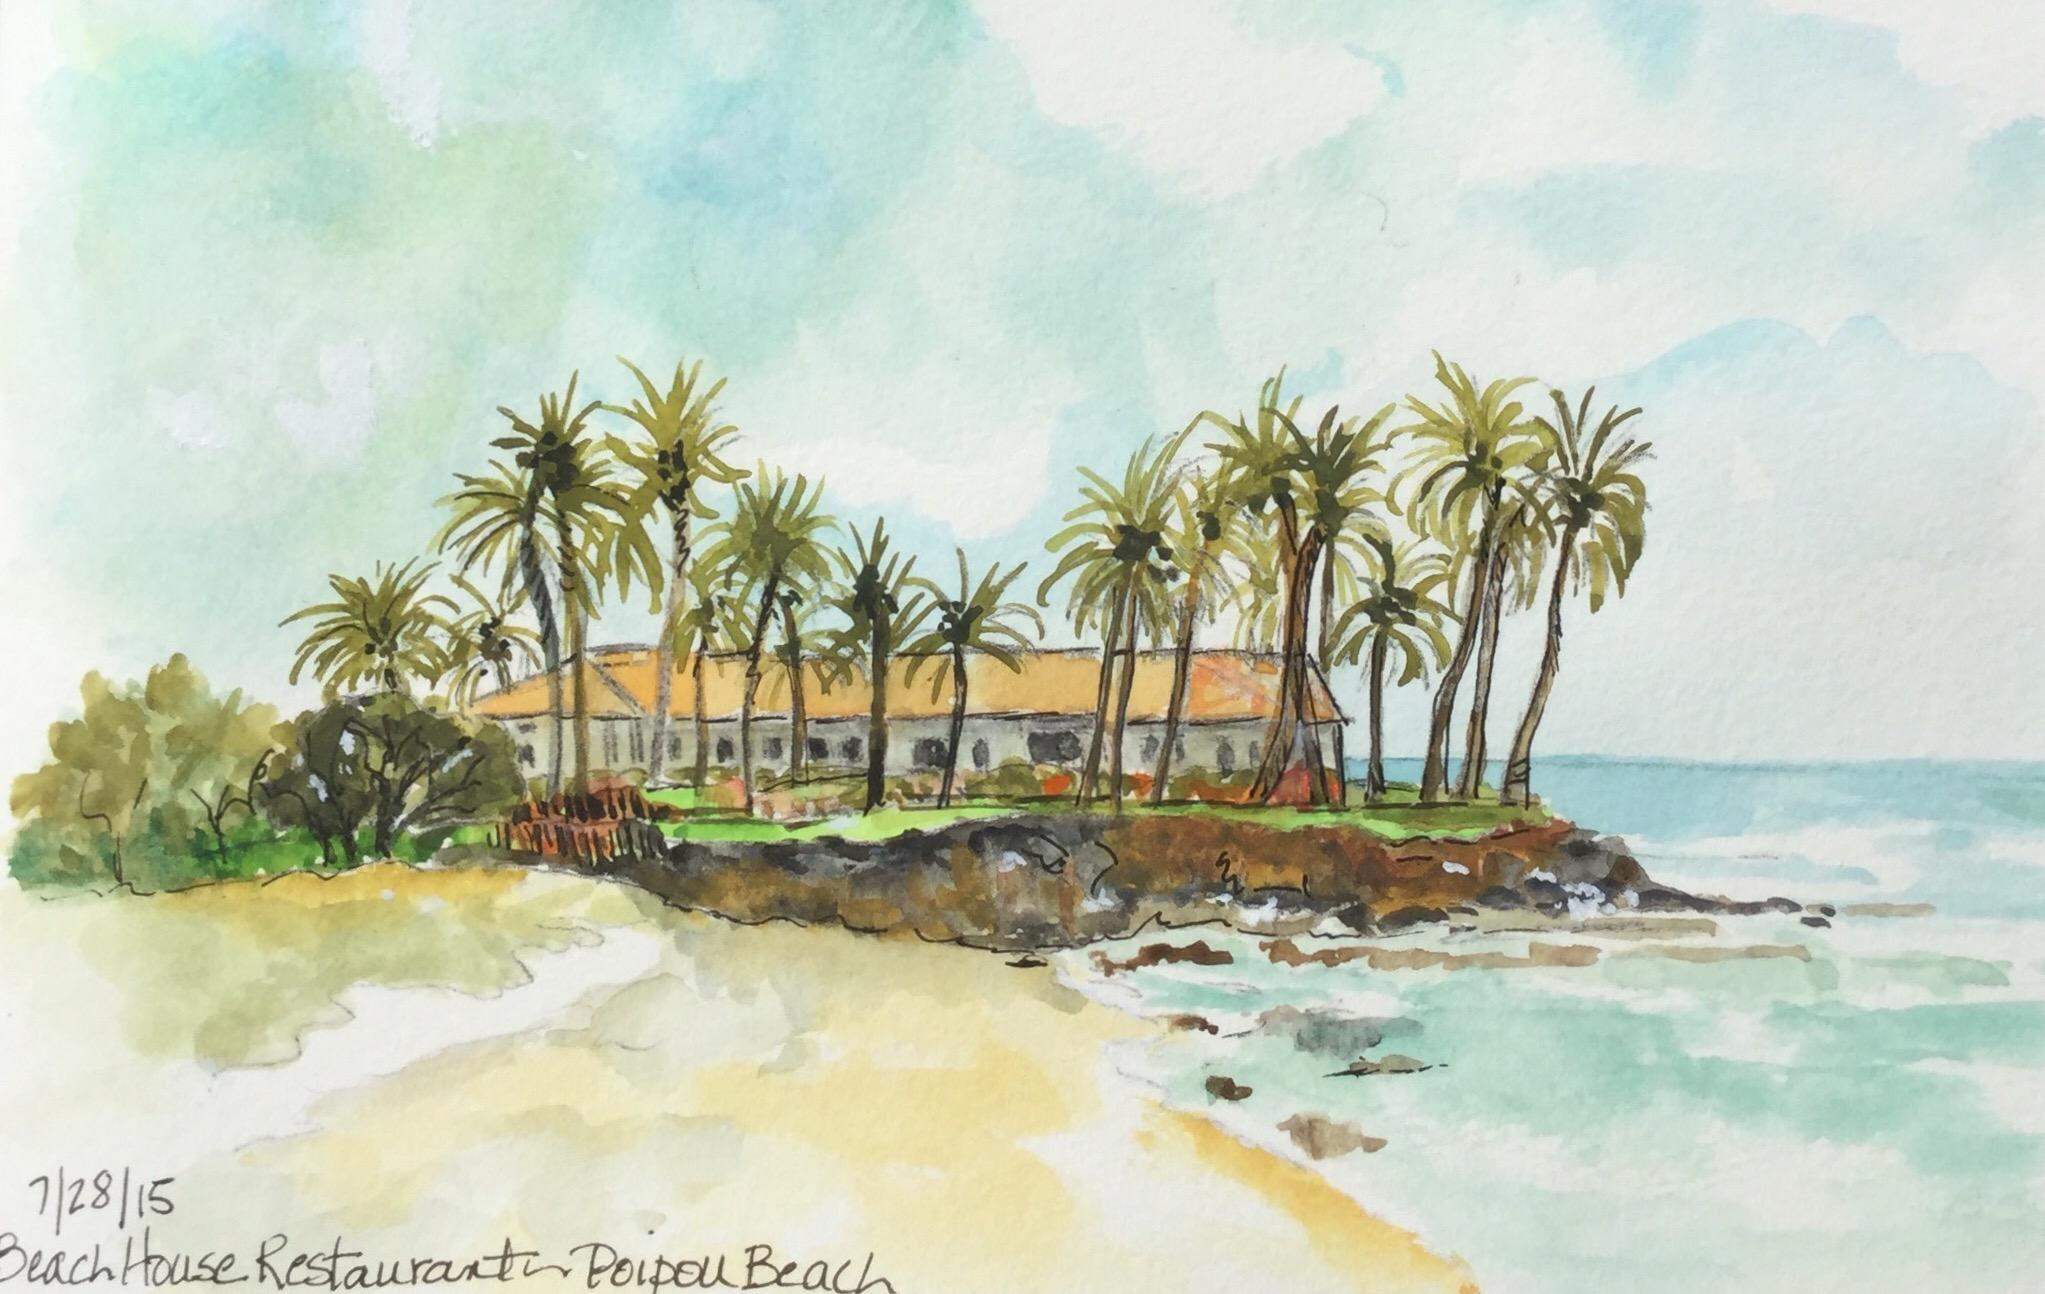 Beach House Restaurant by Carol Jurczak